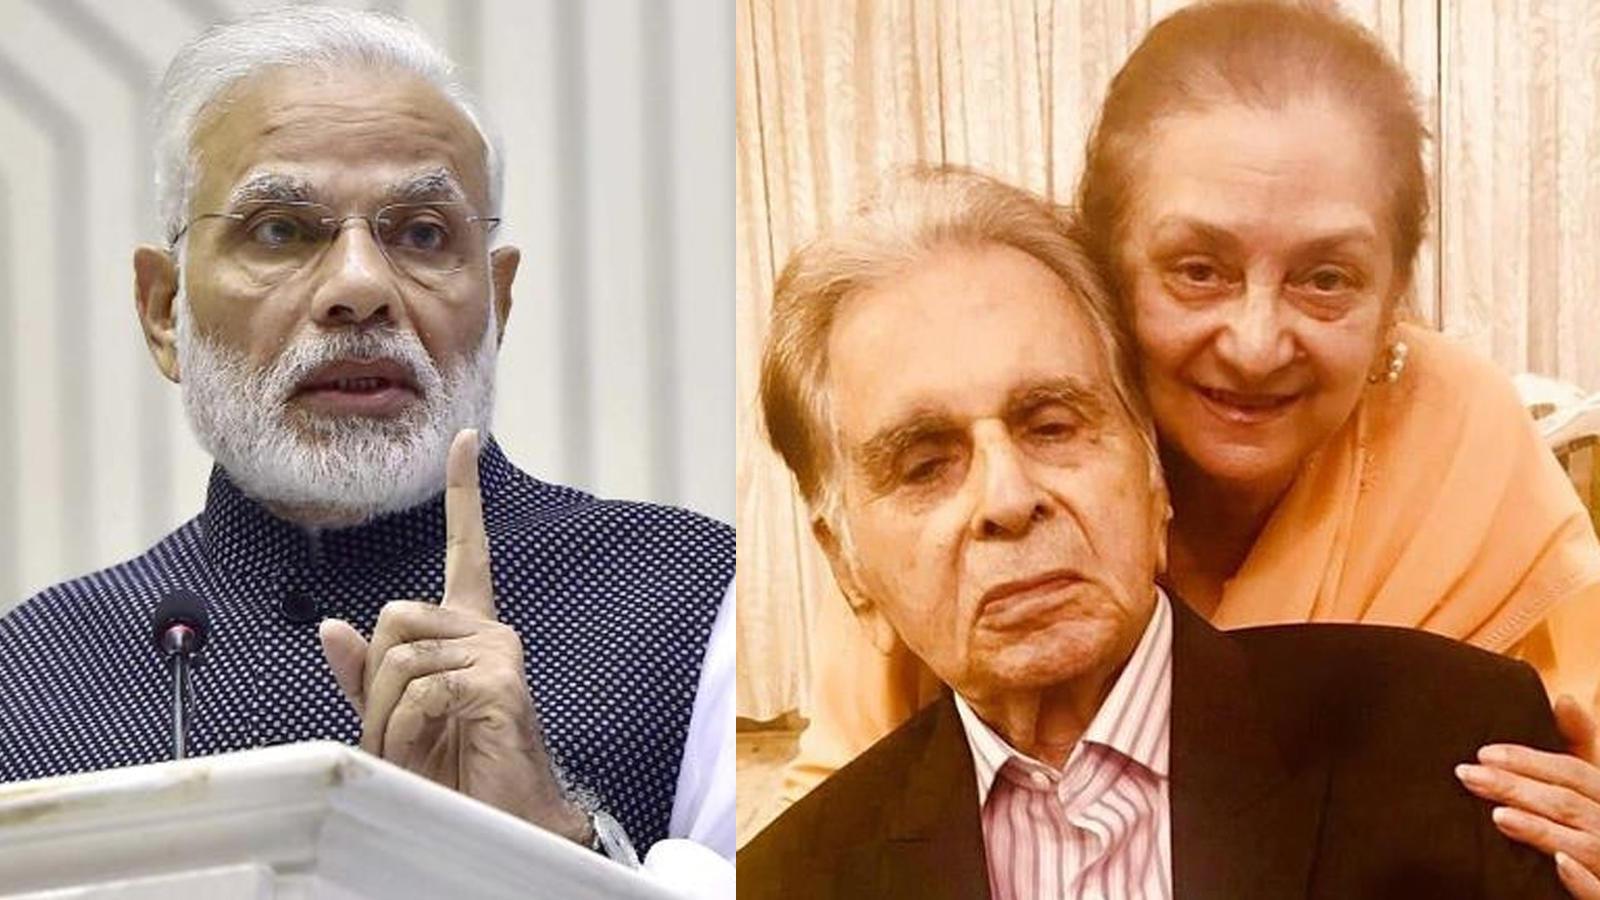 Land mafia issue: Hope for some good result after PM Narendra Modi intervenes, says Saira Banu